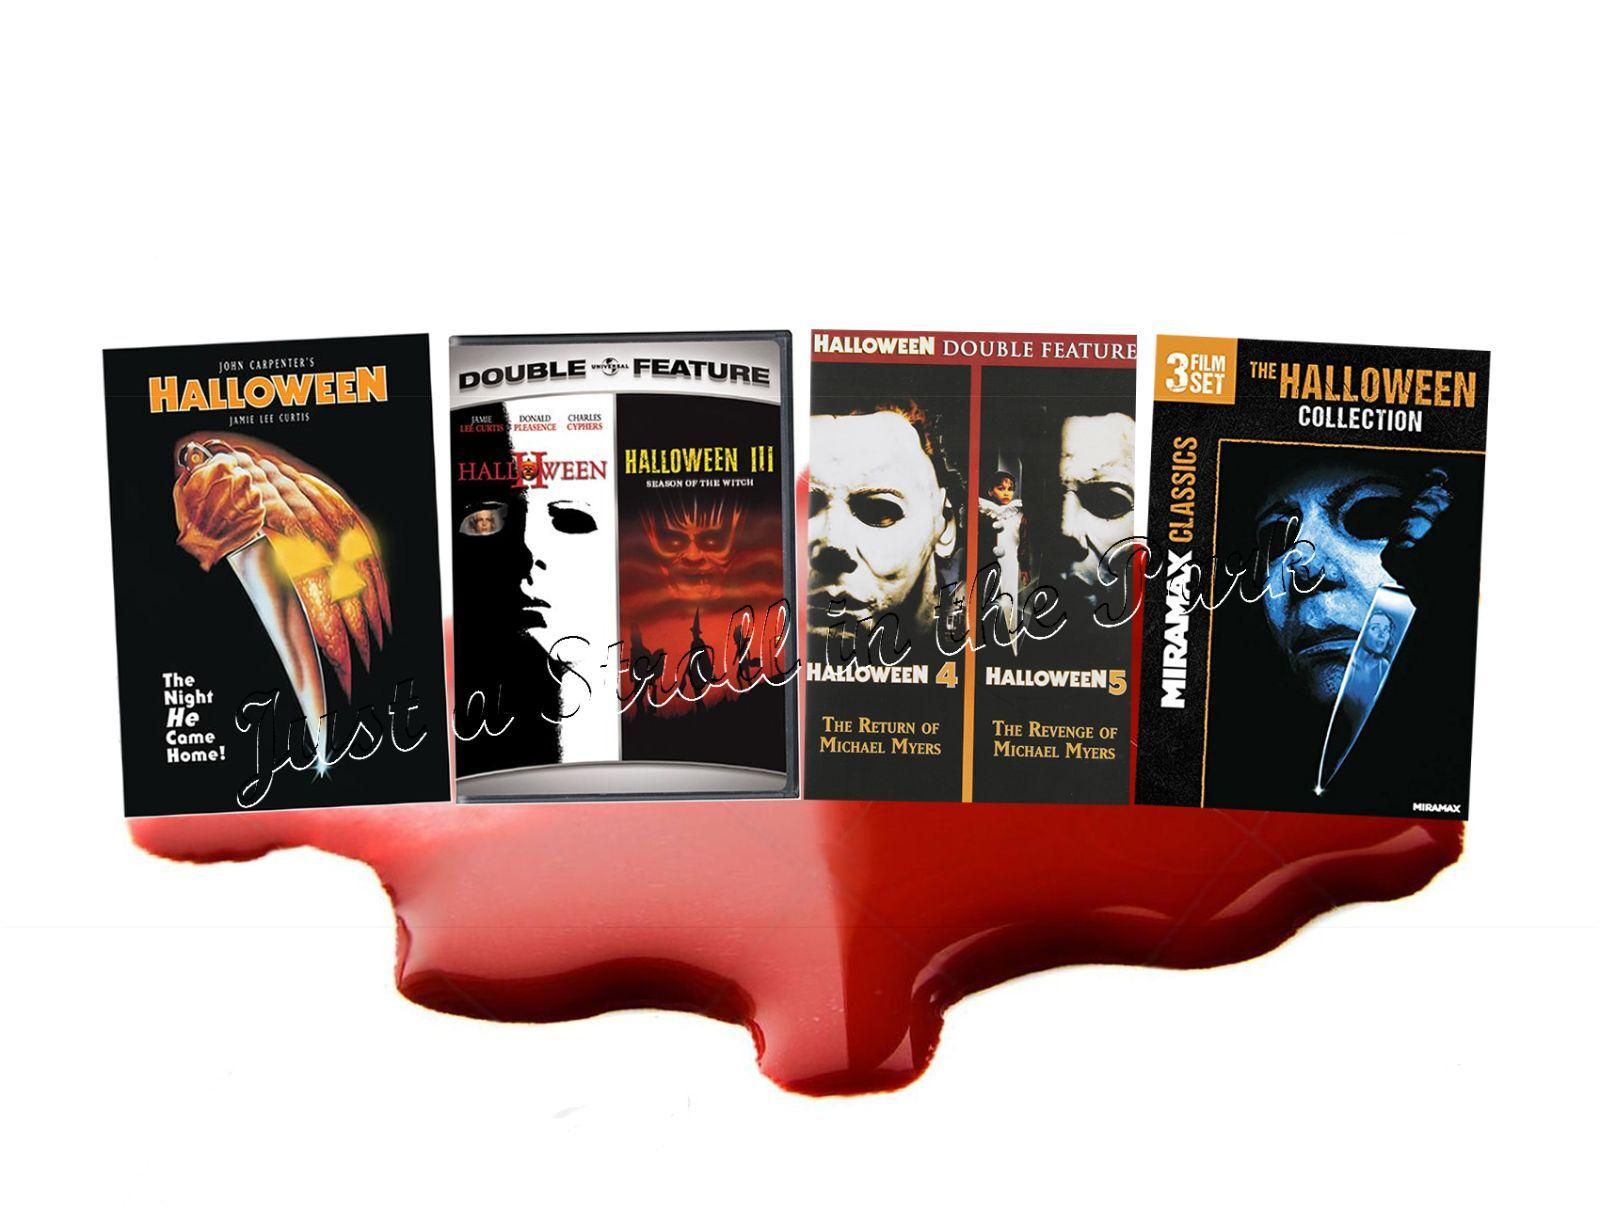 halloween film series complete movie 1 2 3 4 5 6 7 8 box / dvd set(s